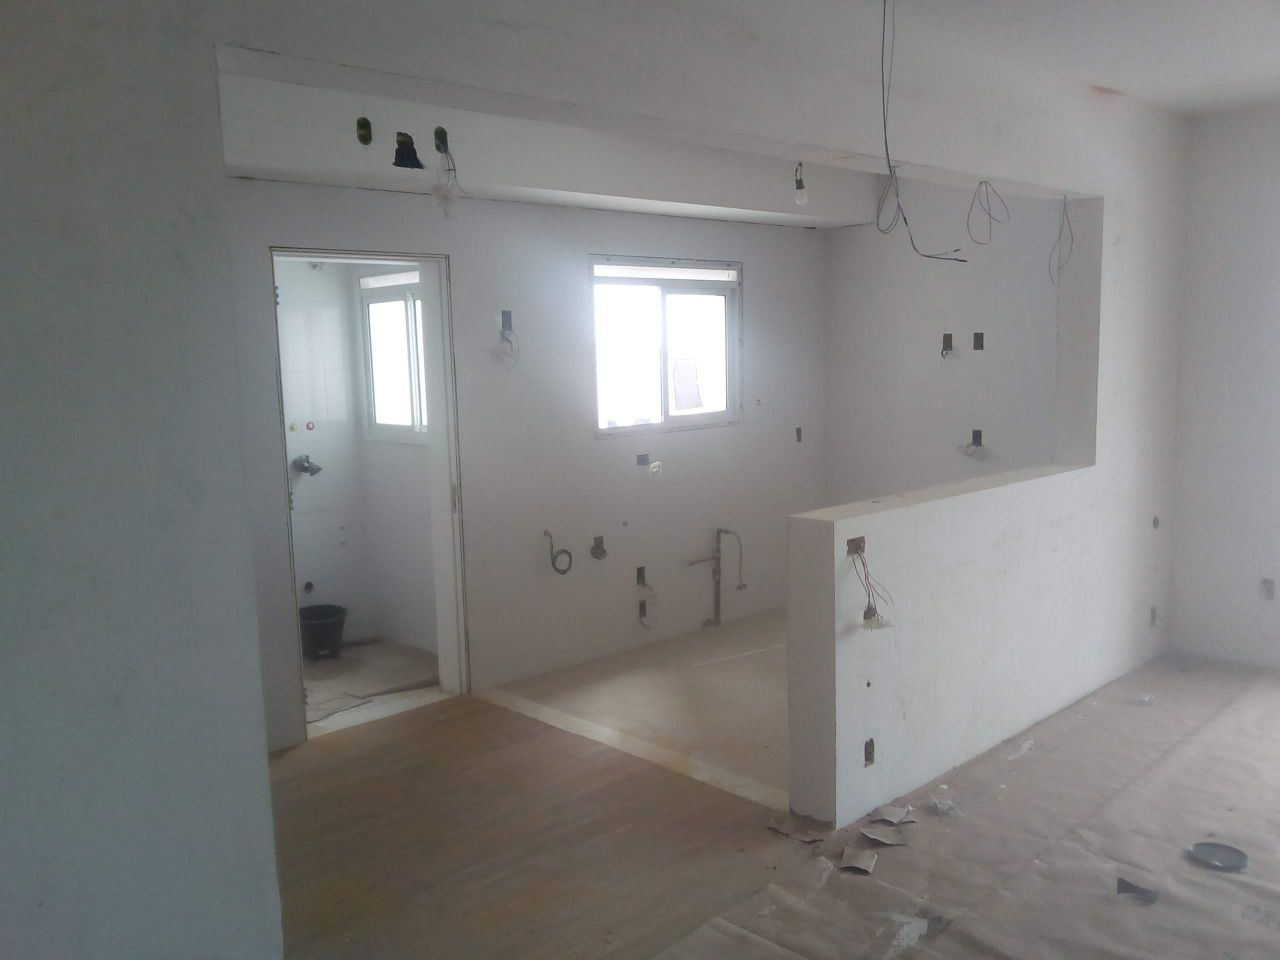 Sala apartamento sendo finalizada